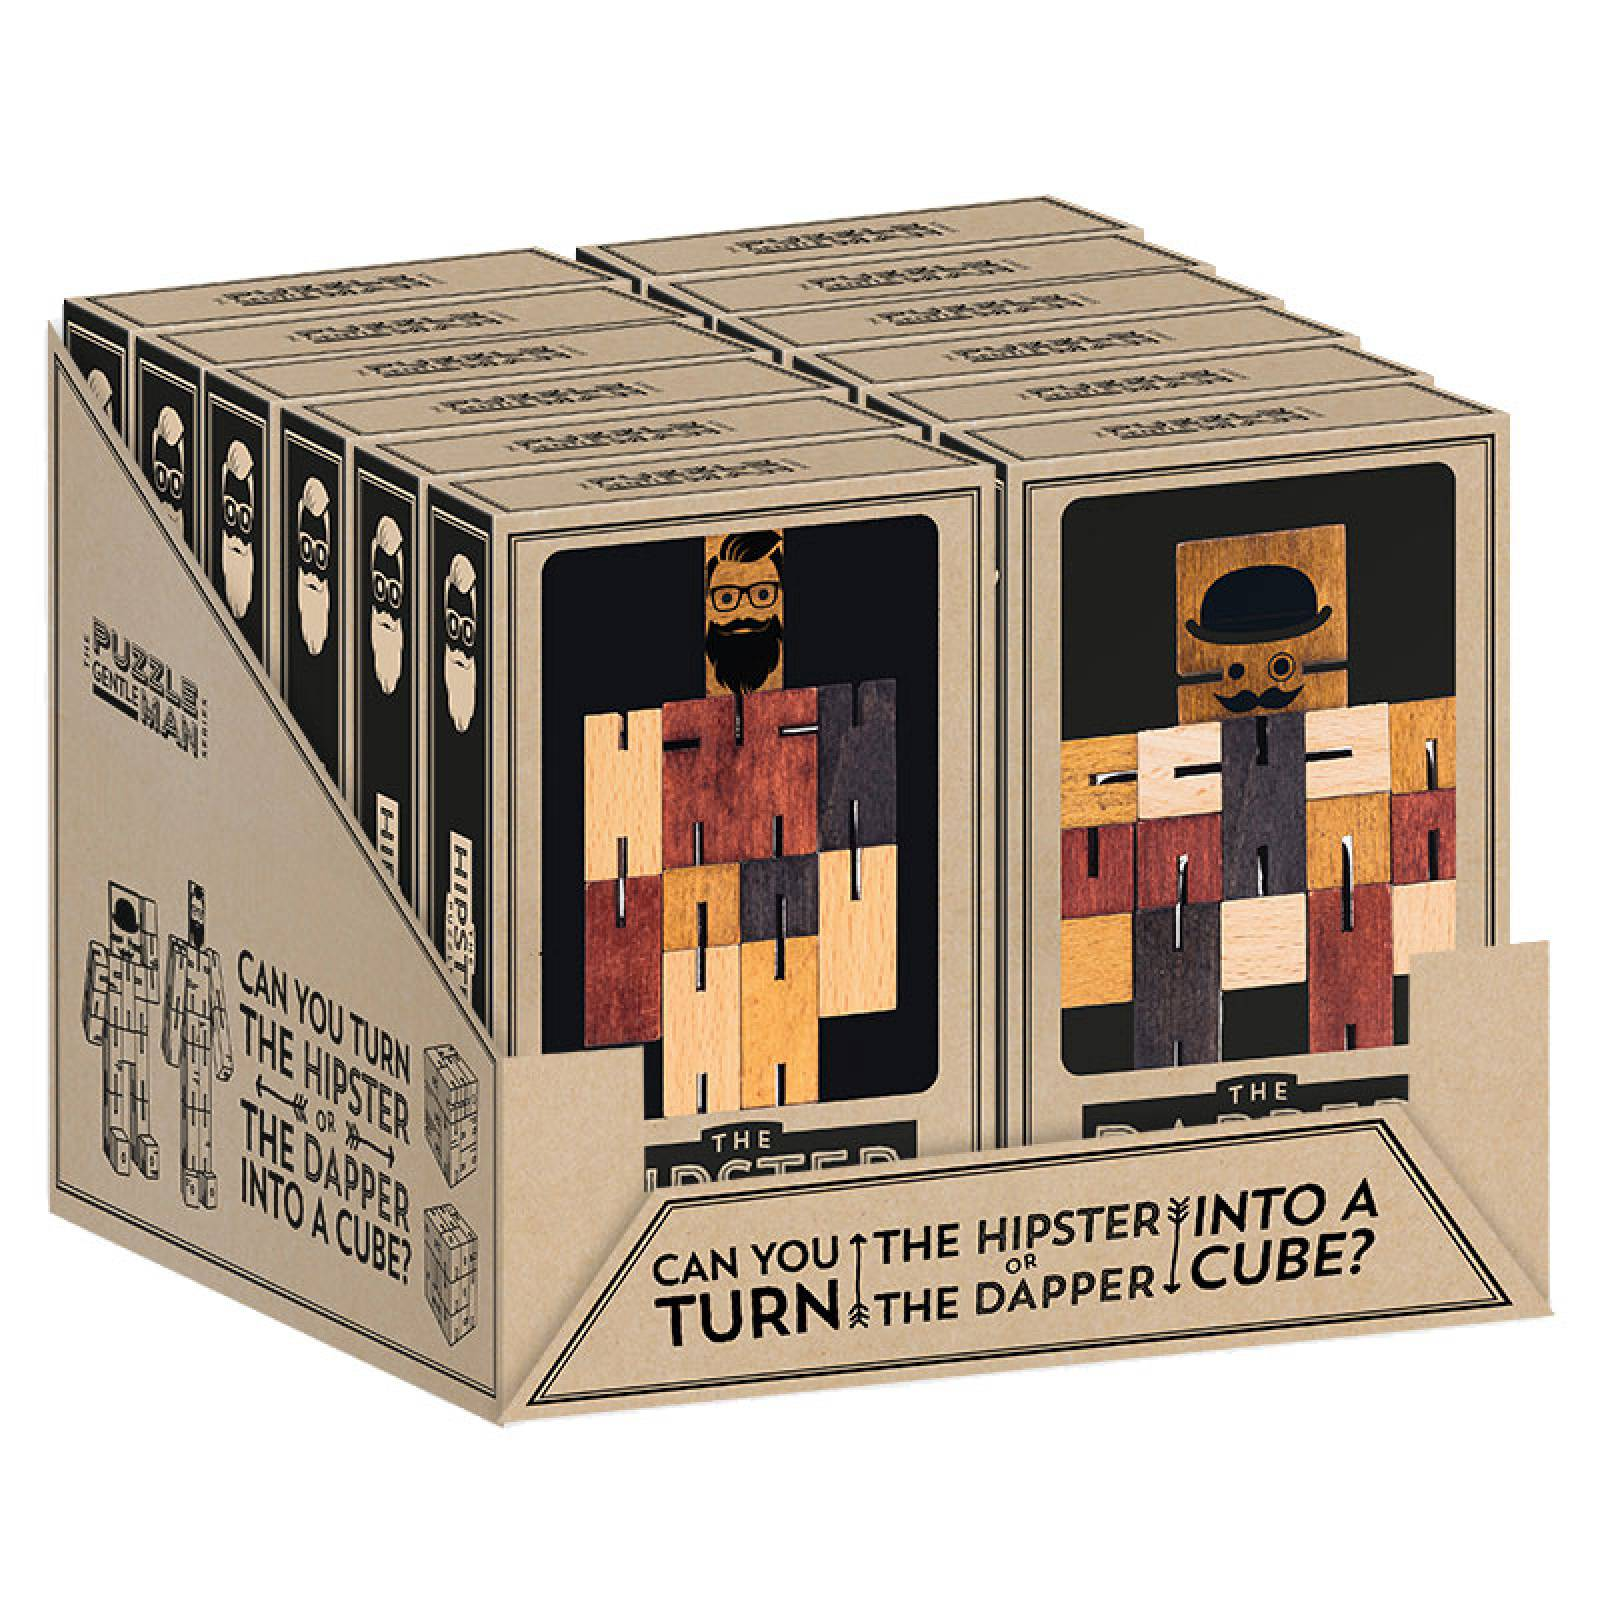 Gentleman Hipster / Dapper Wooden Cube Puzzle